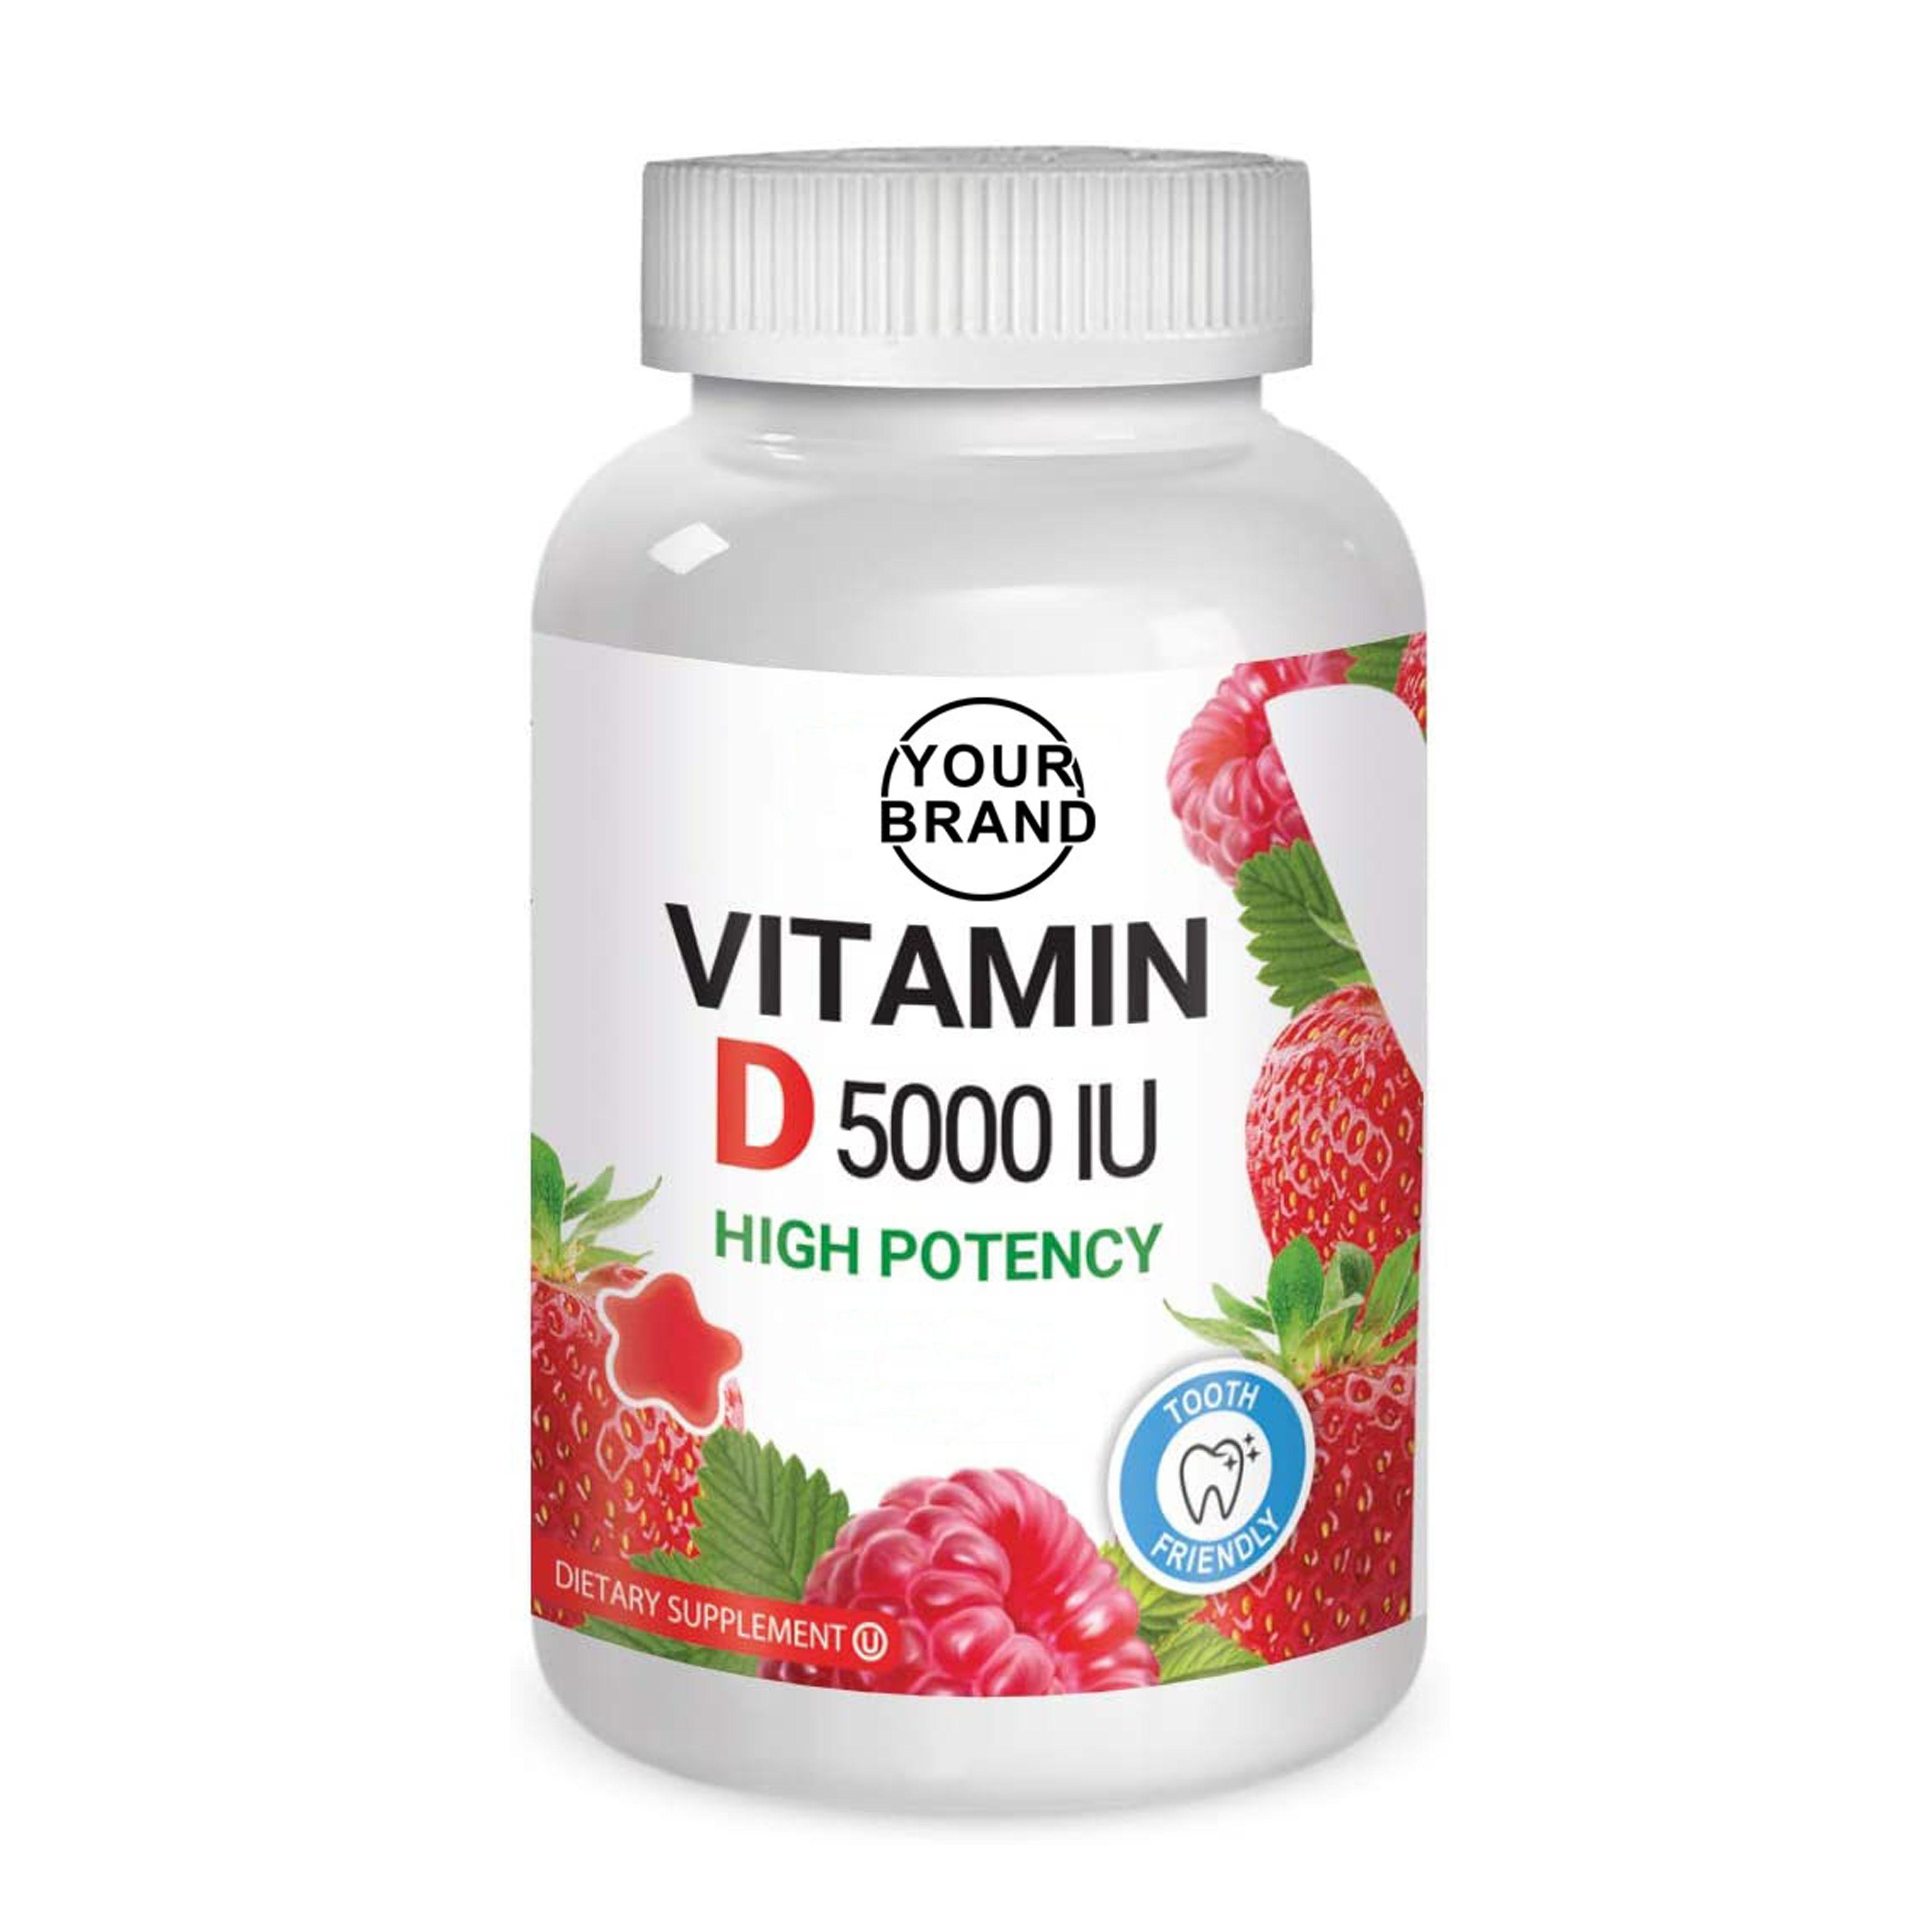 cholecalciferol vitamin d3 vitamin d supplement manufacture